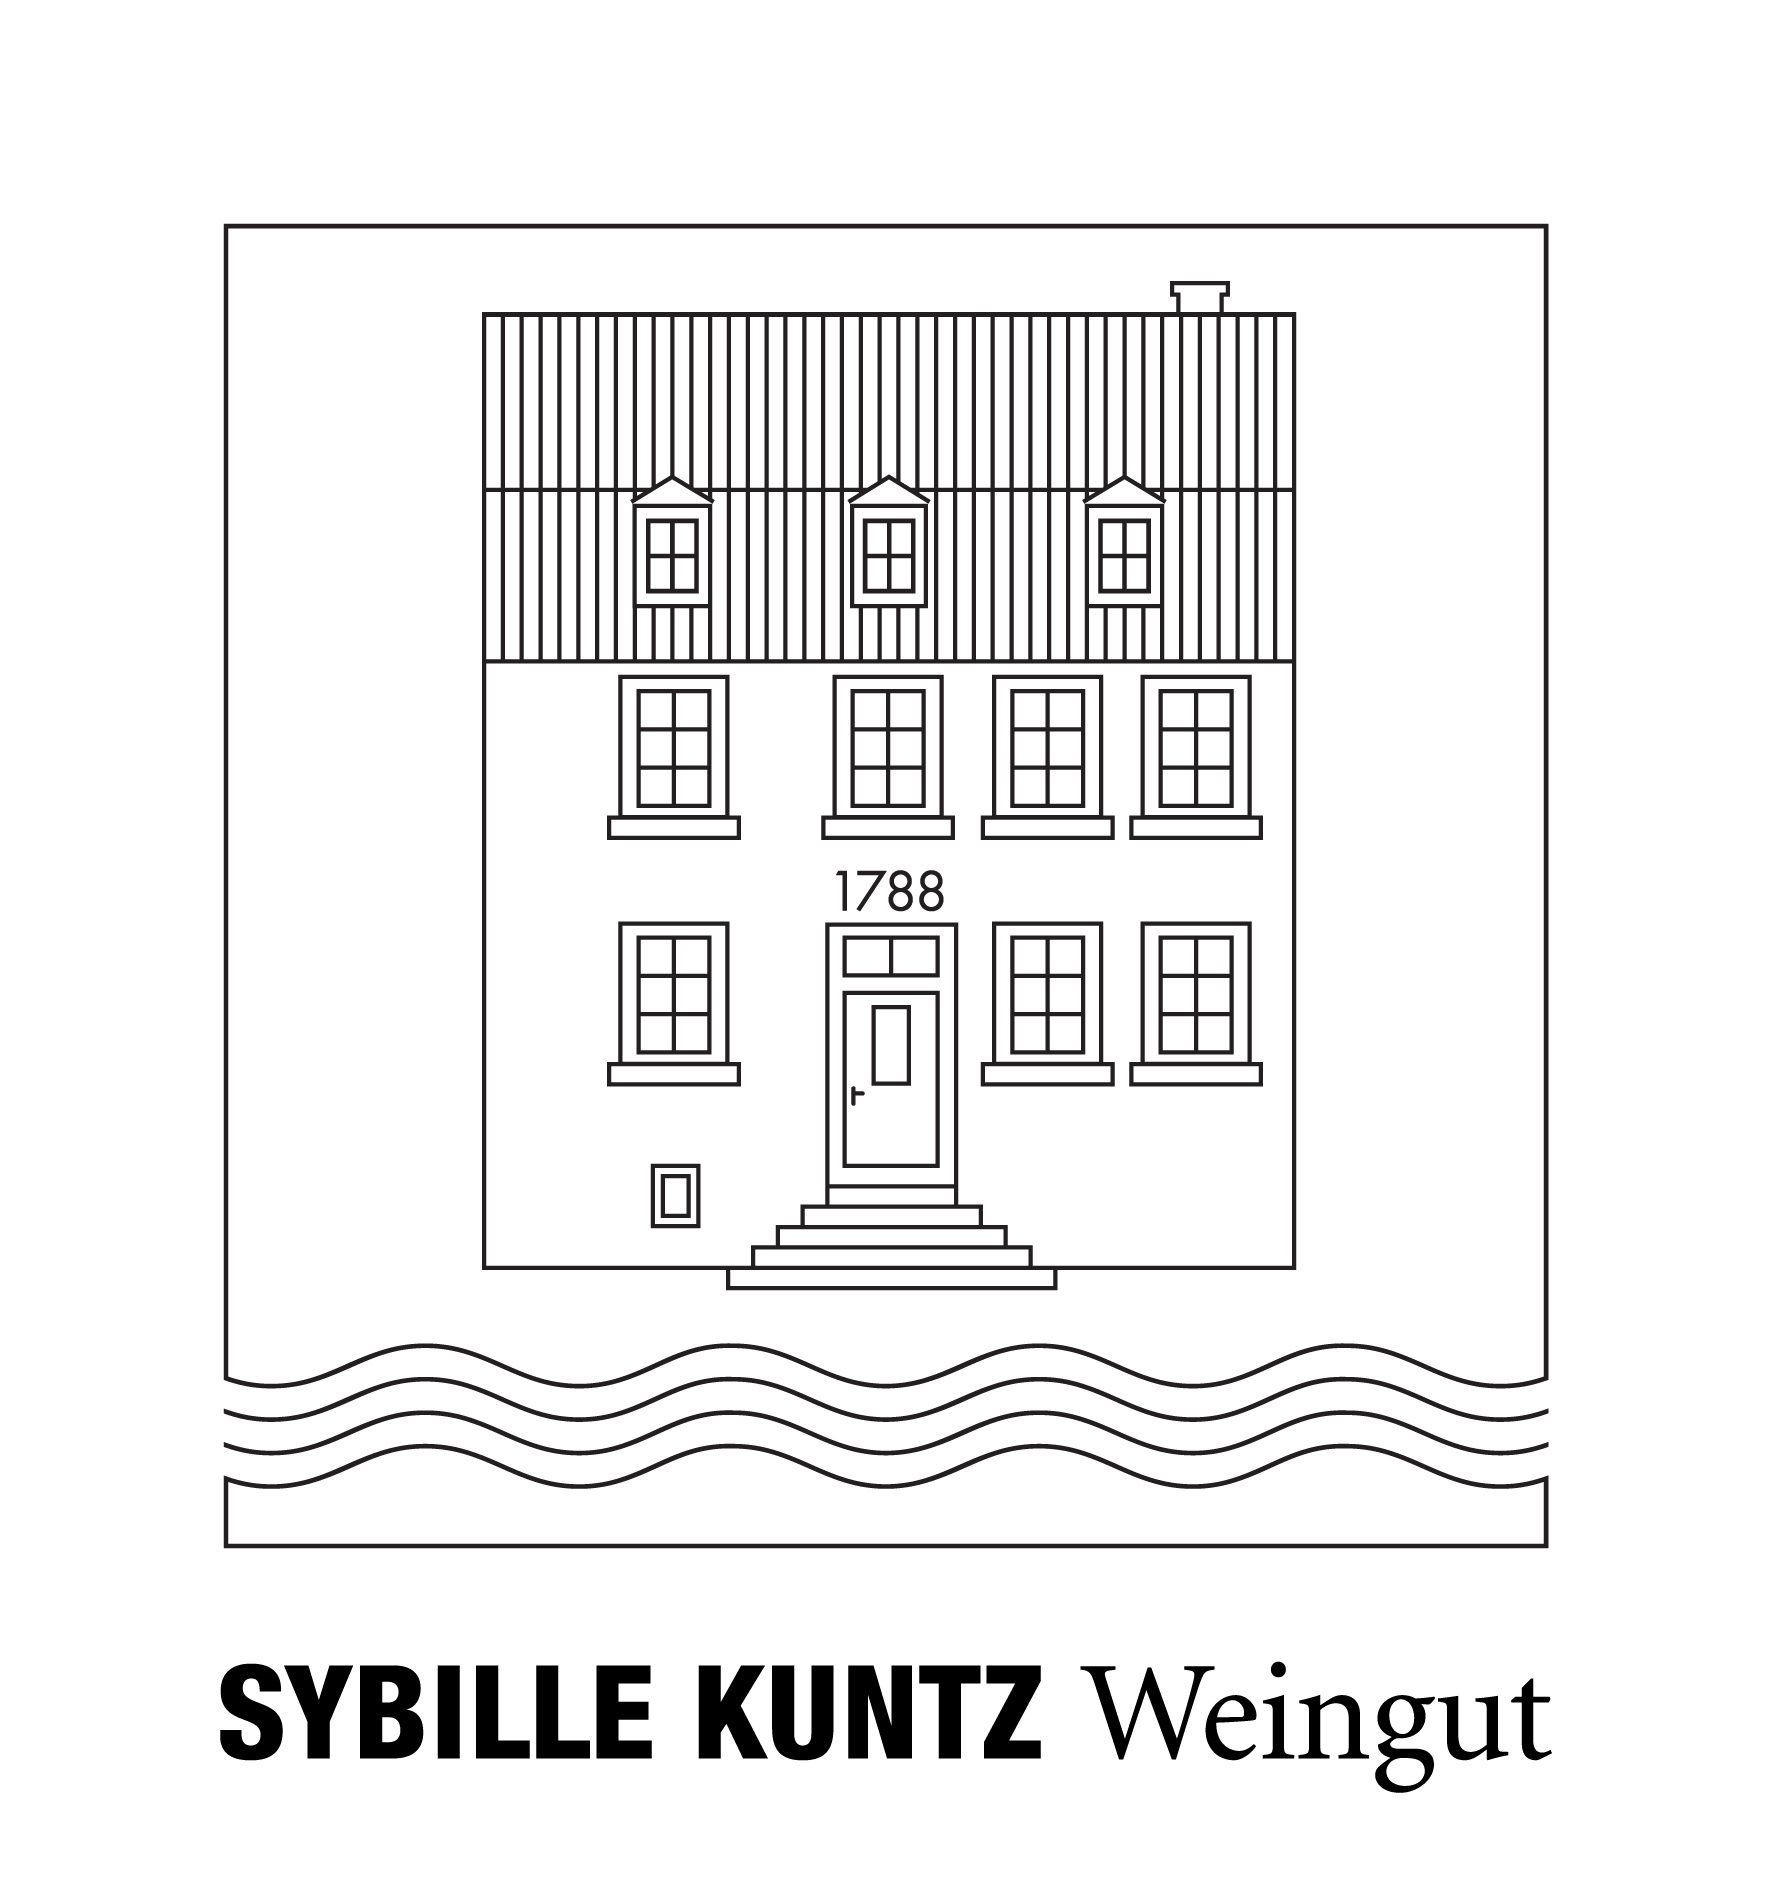 SYBILLE KUNTZ Weingut logo